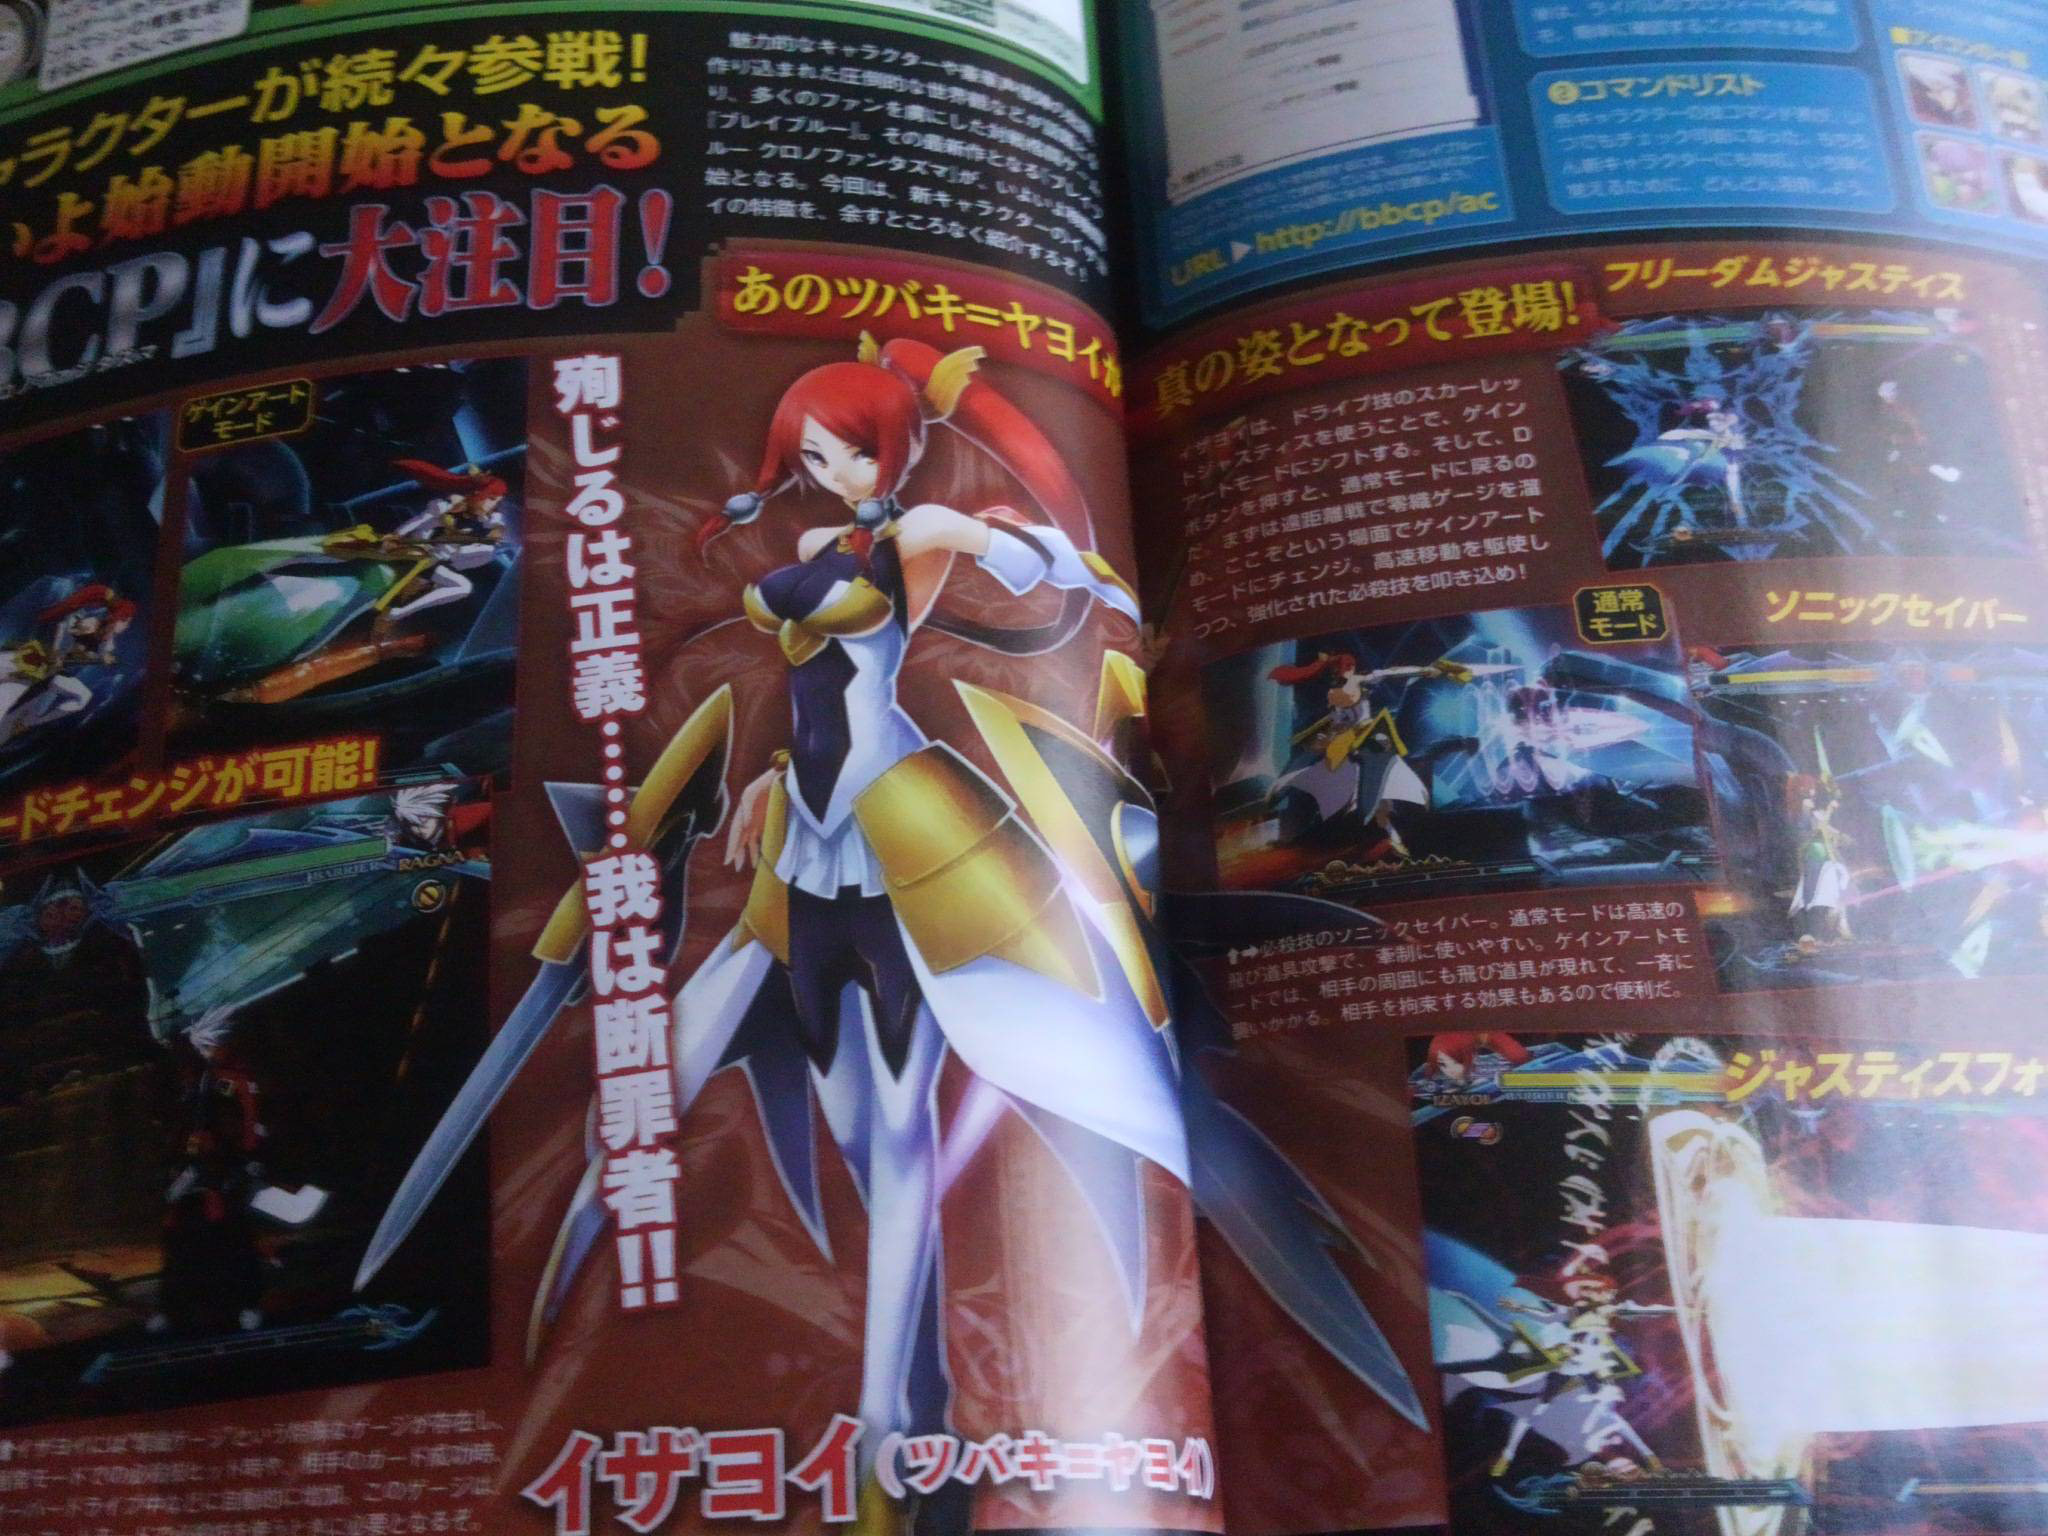 Blazblue: Chrono Phantasma new character Izayoi image #5